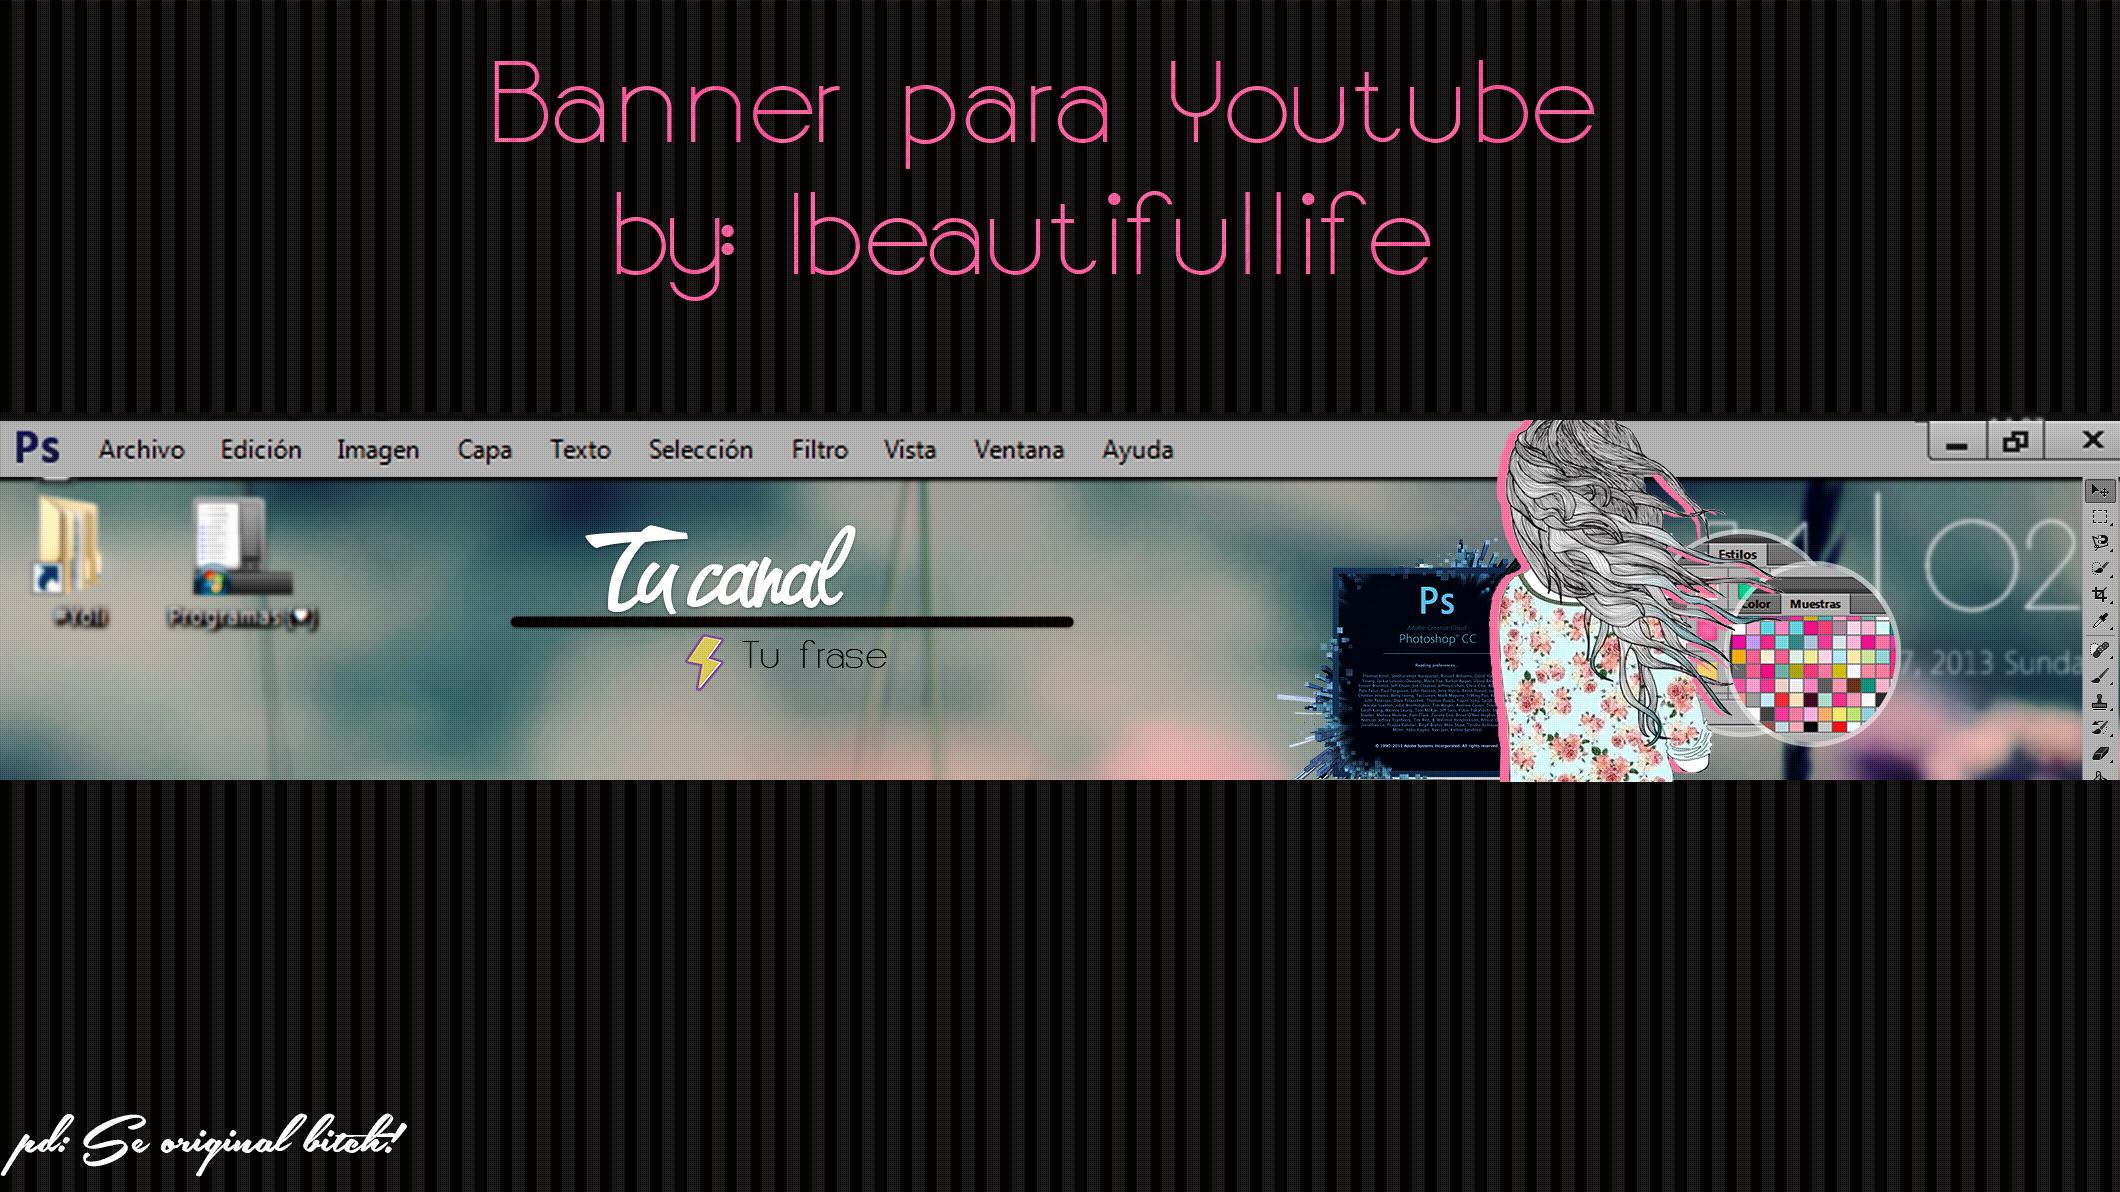 Banner Editables Para Youtube 2013 by JuaanLopez on DeviantArt